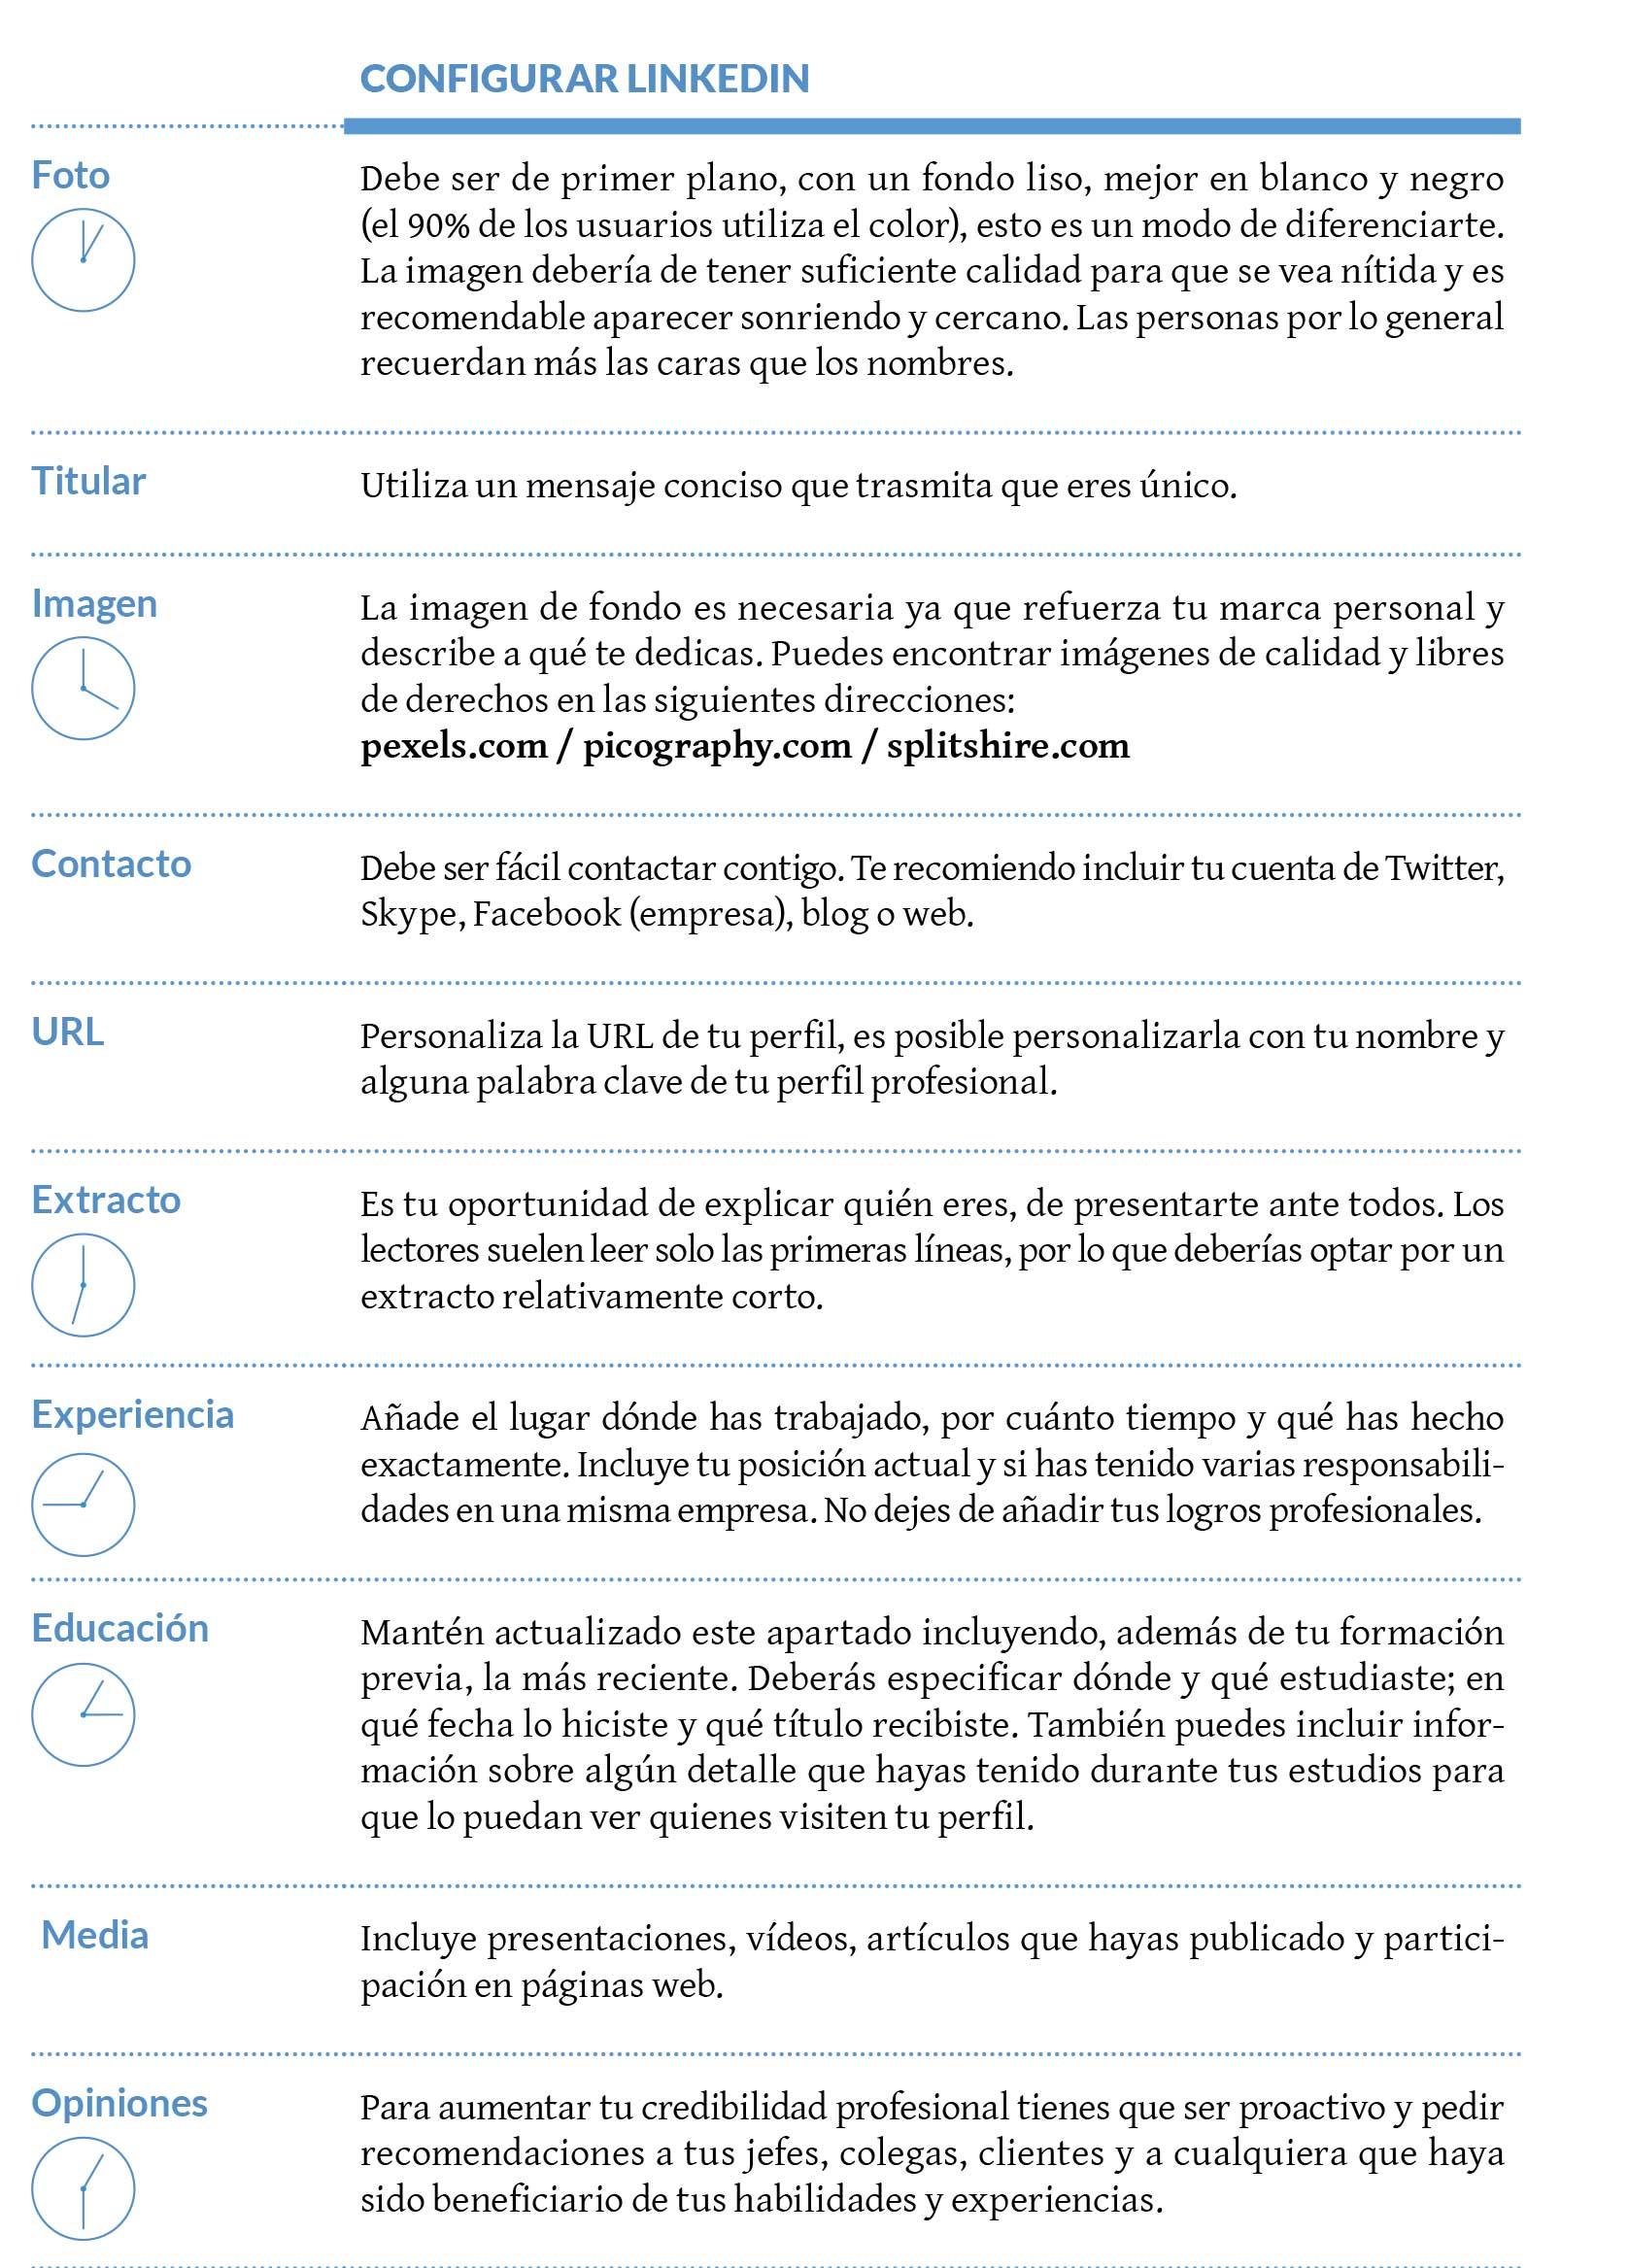 Marca personal | Revista Gaceta Audio